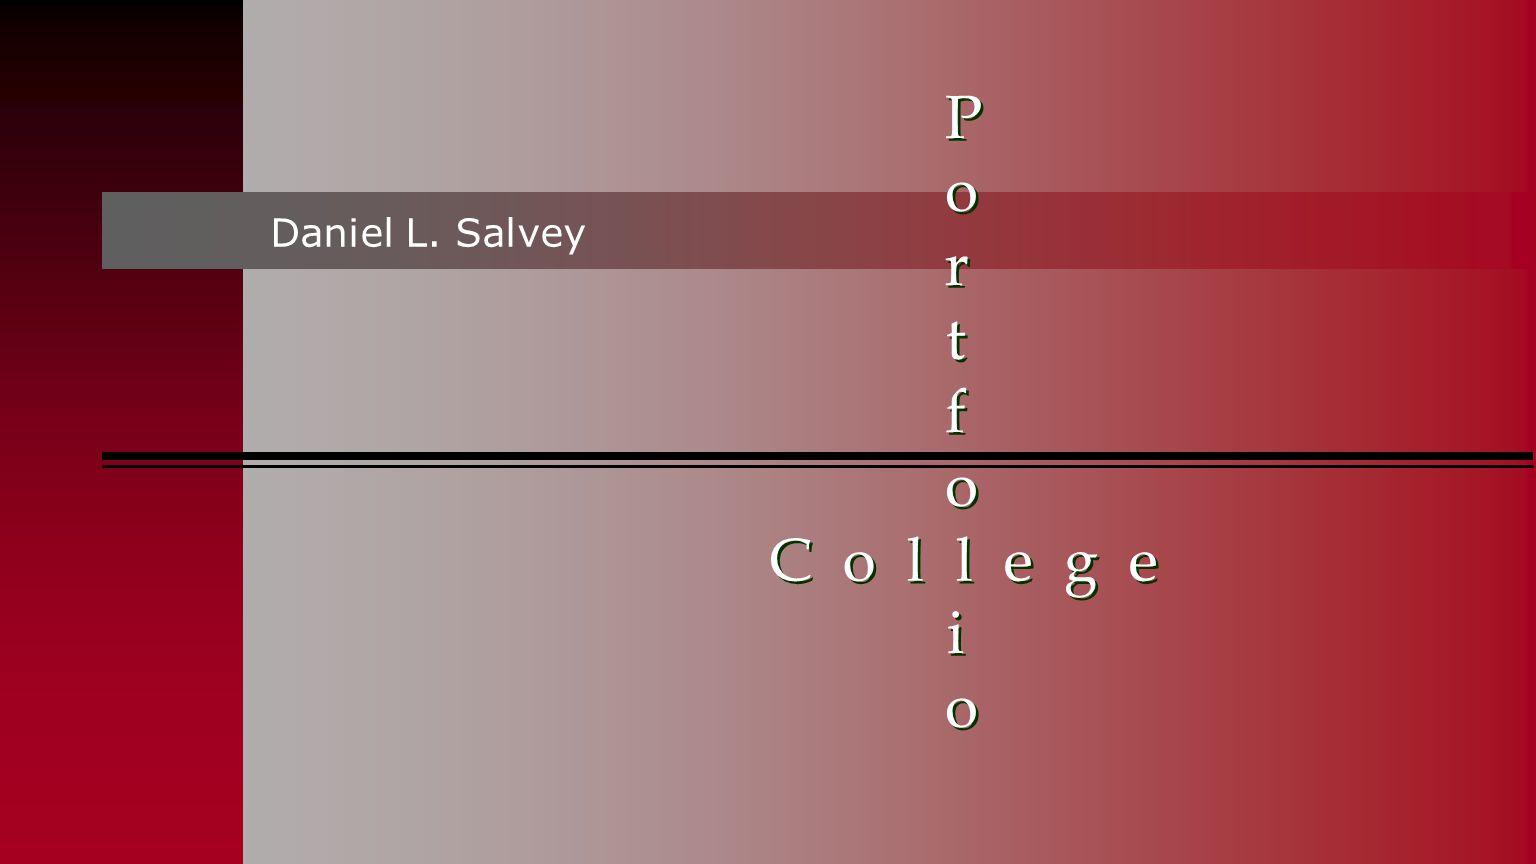 C o l l e g e Daniel L. Salvey Portfo ioPortfo io Portfo ioPortfo io